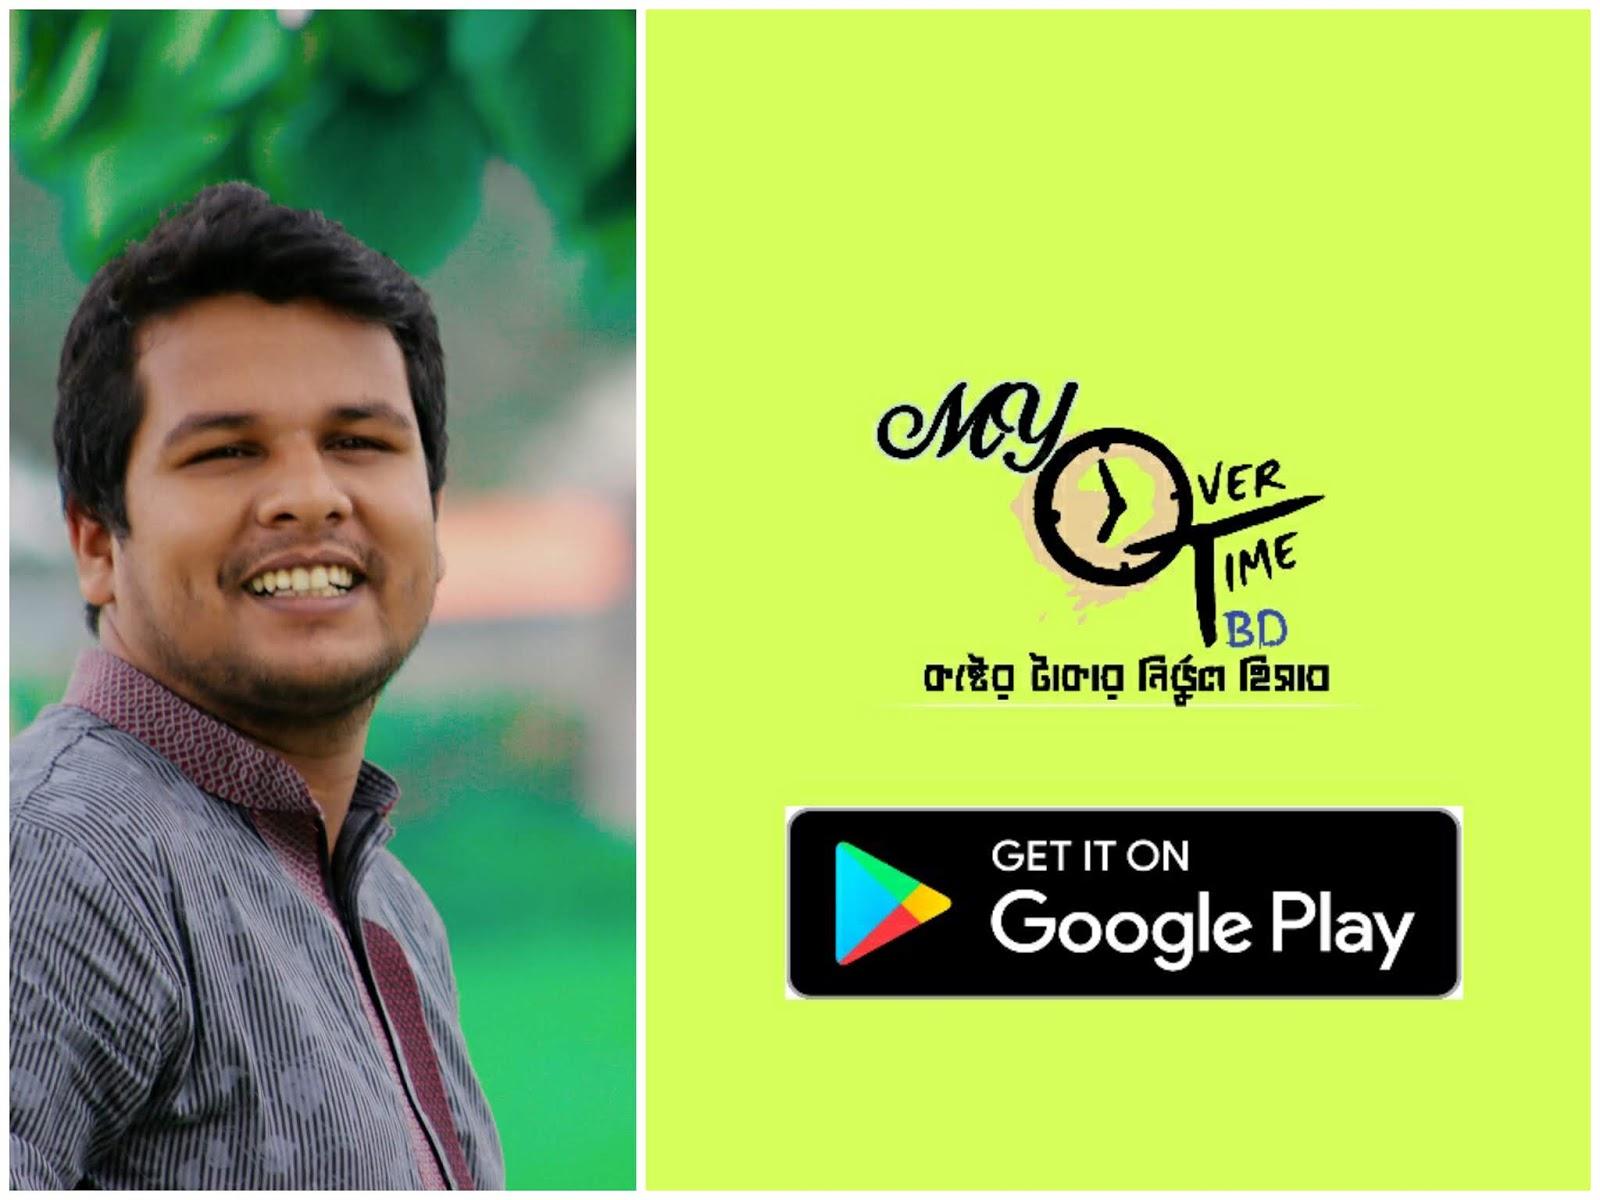 My Overtime Bd apk, Saiful Islam Bari